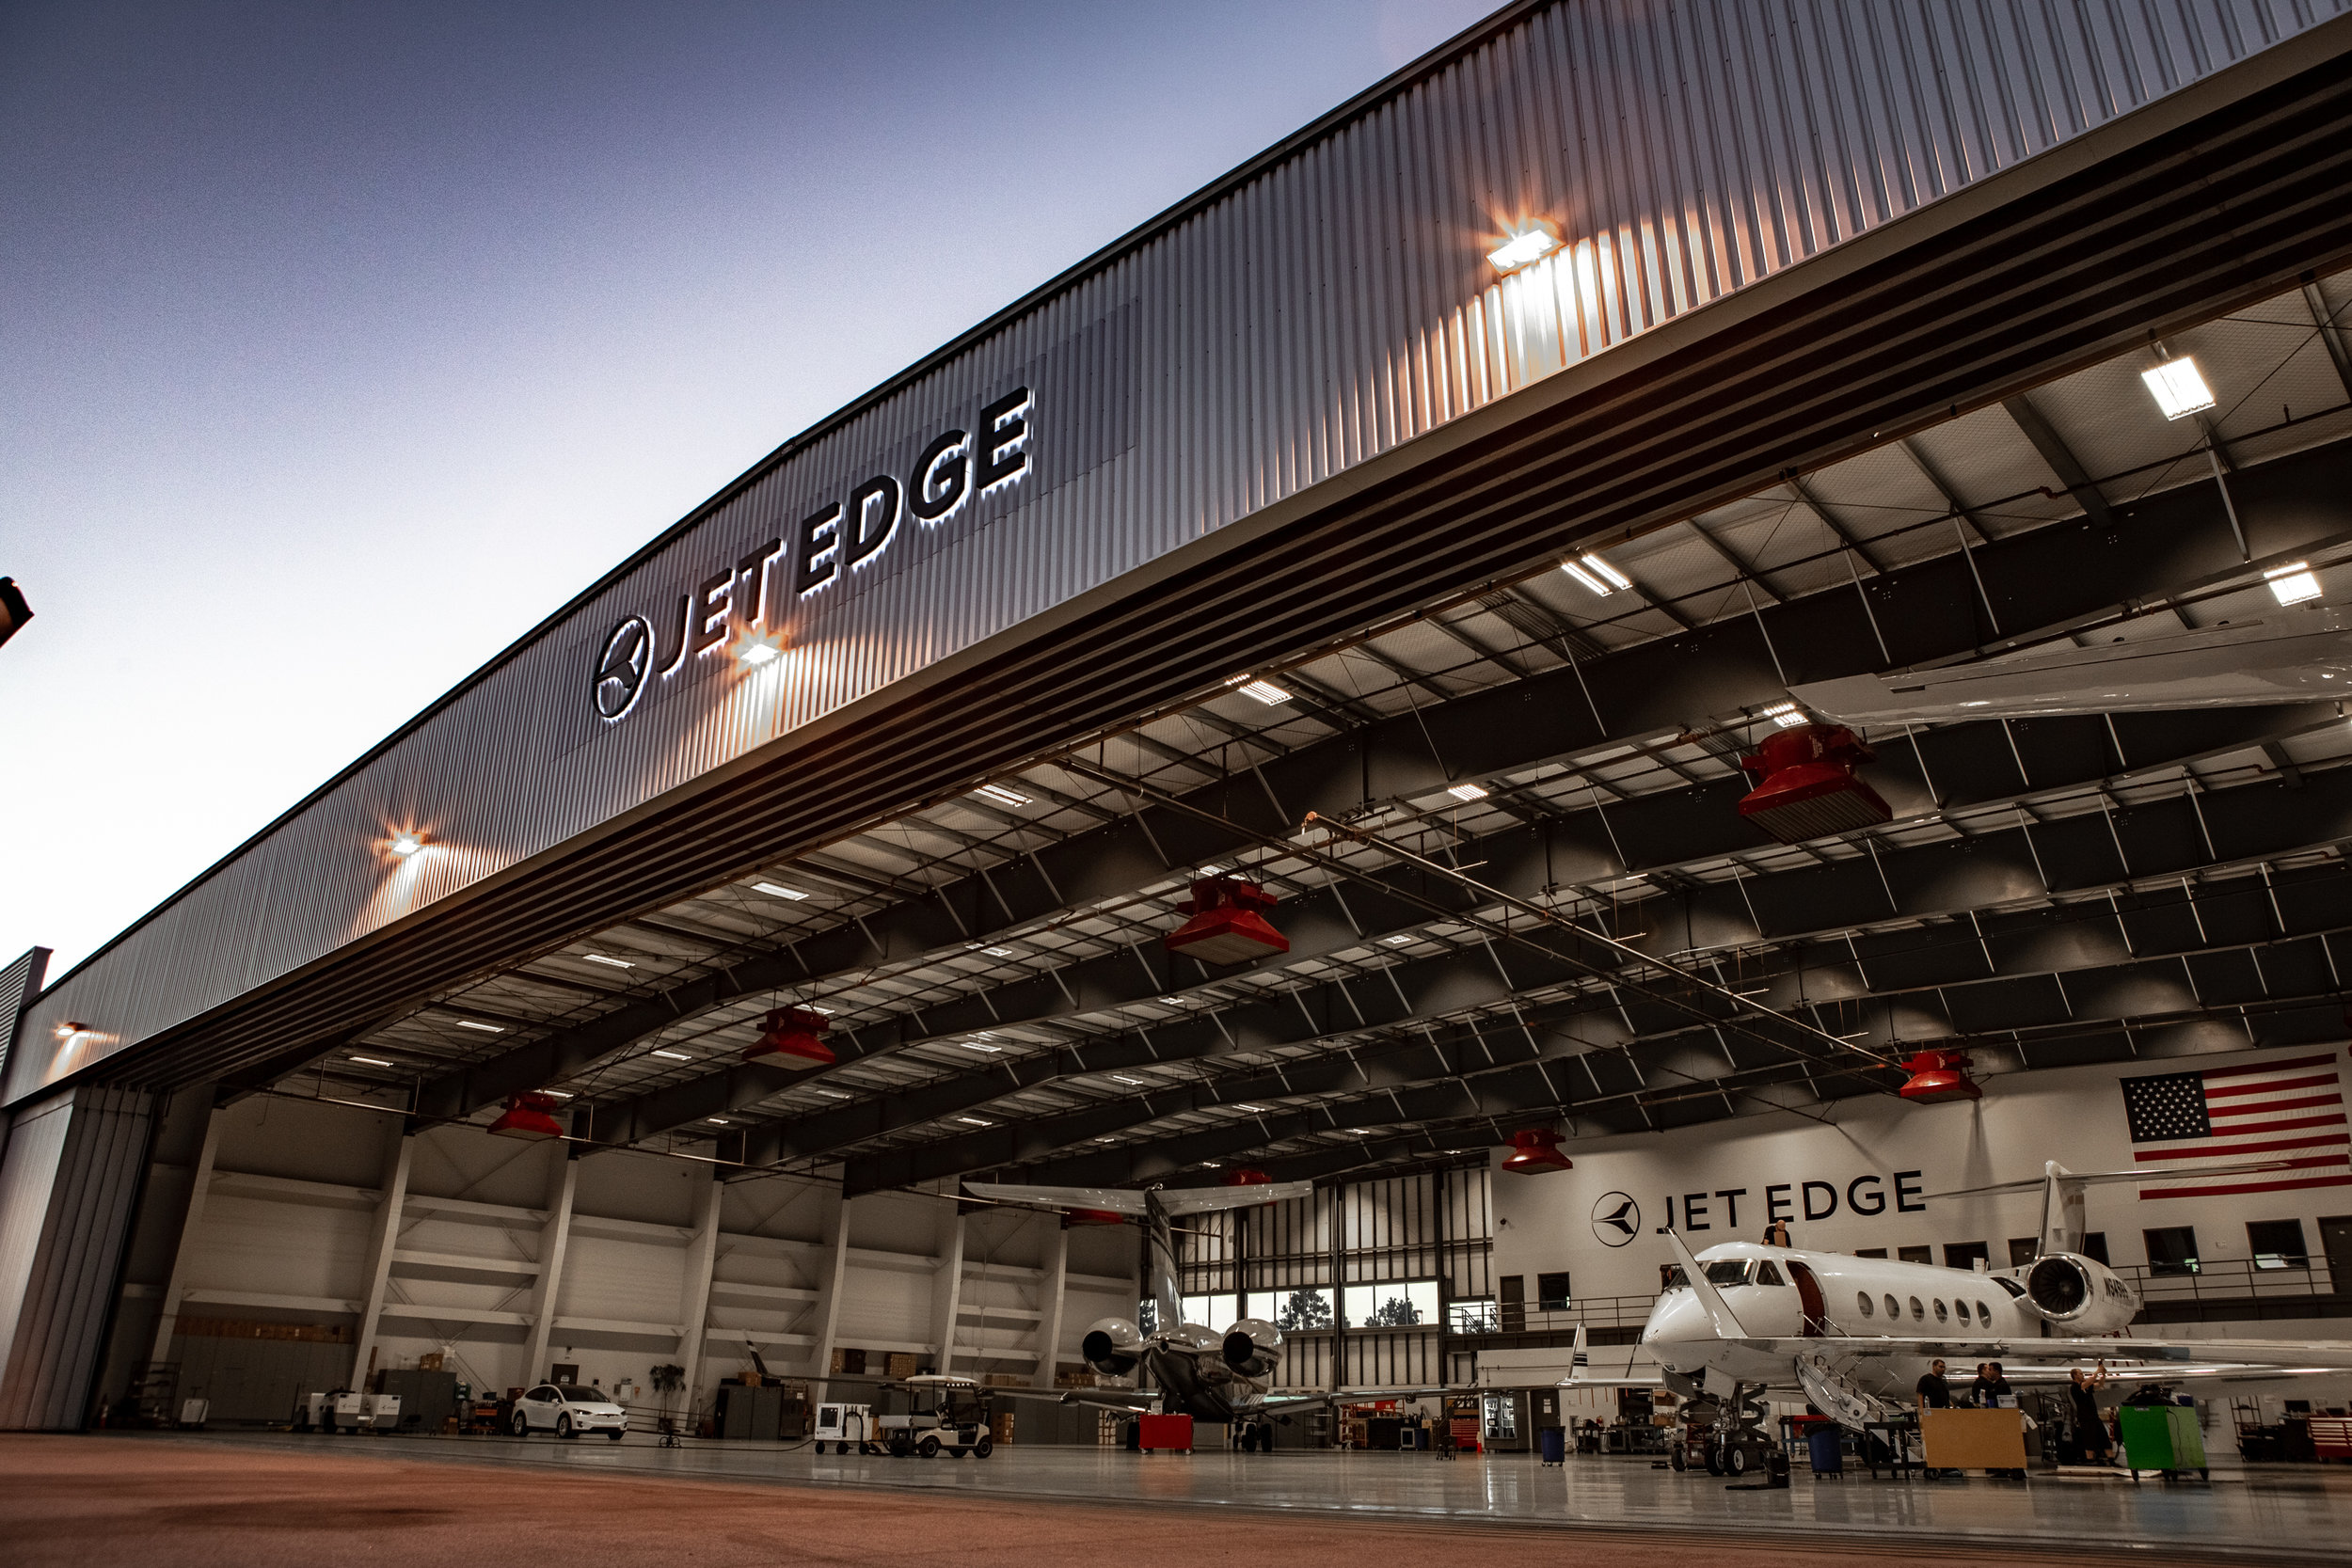 JetEdge-08292018-0022.jpg